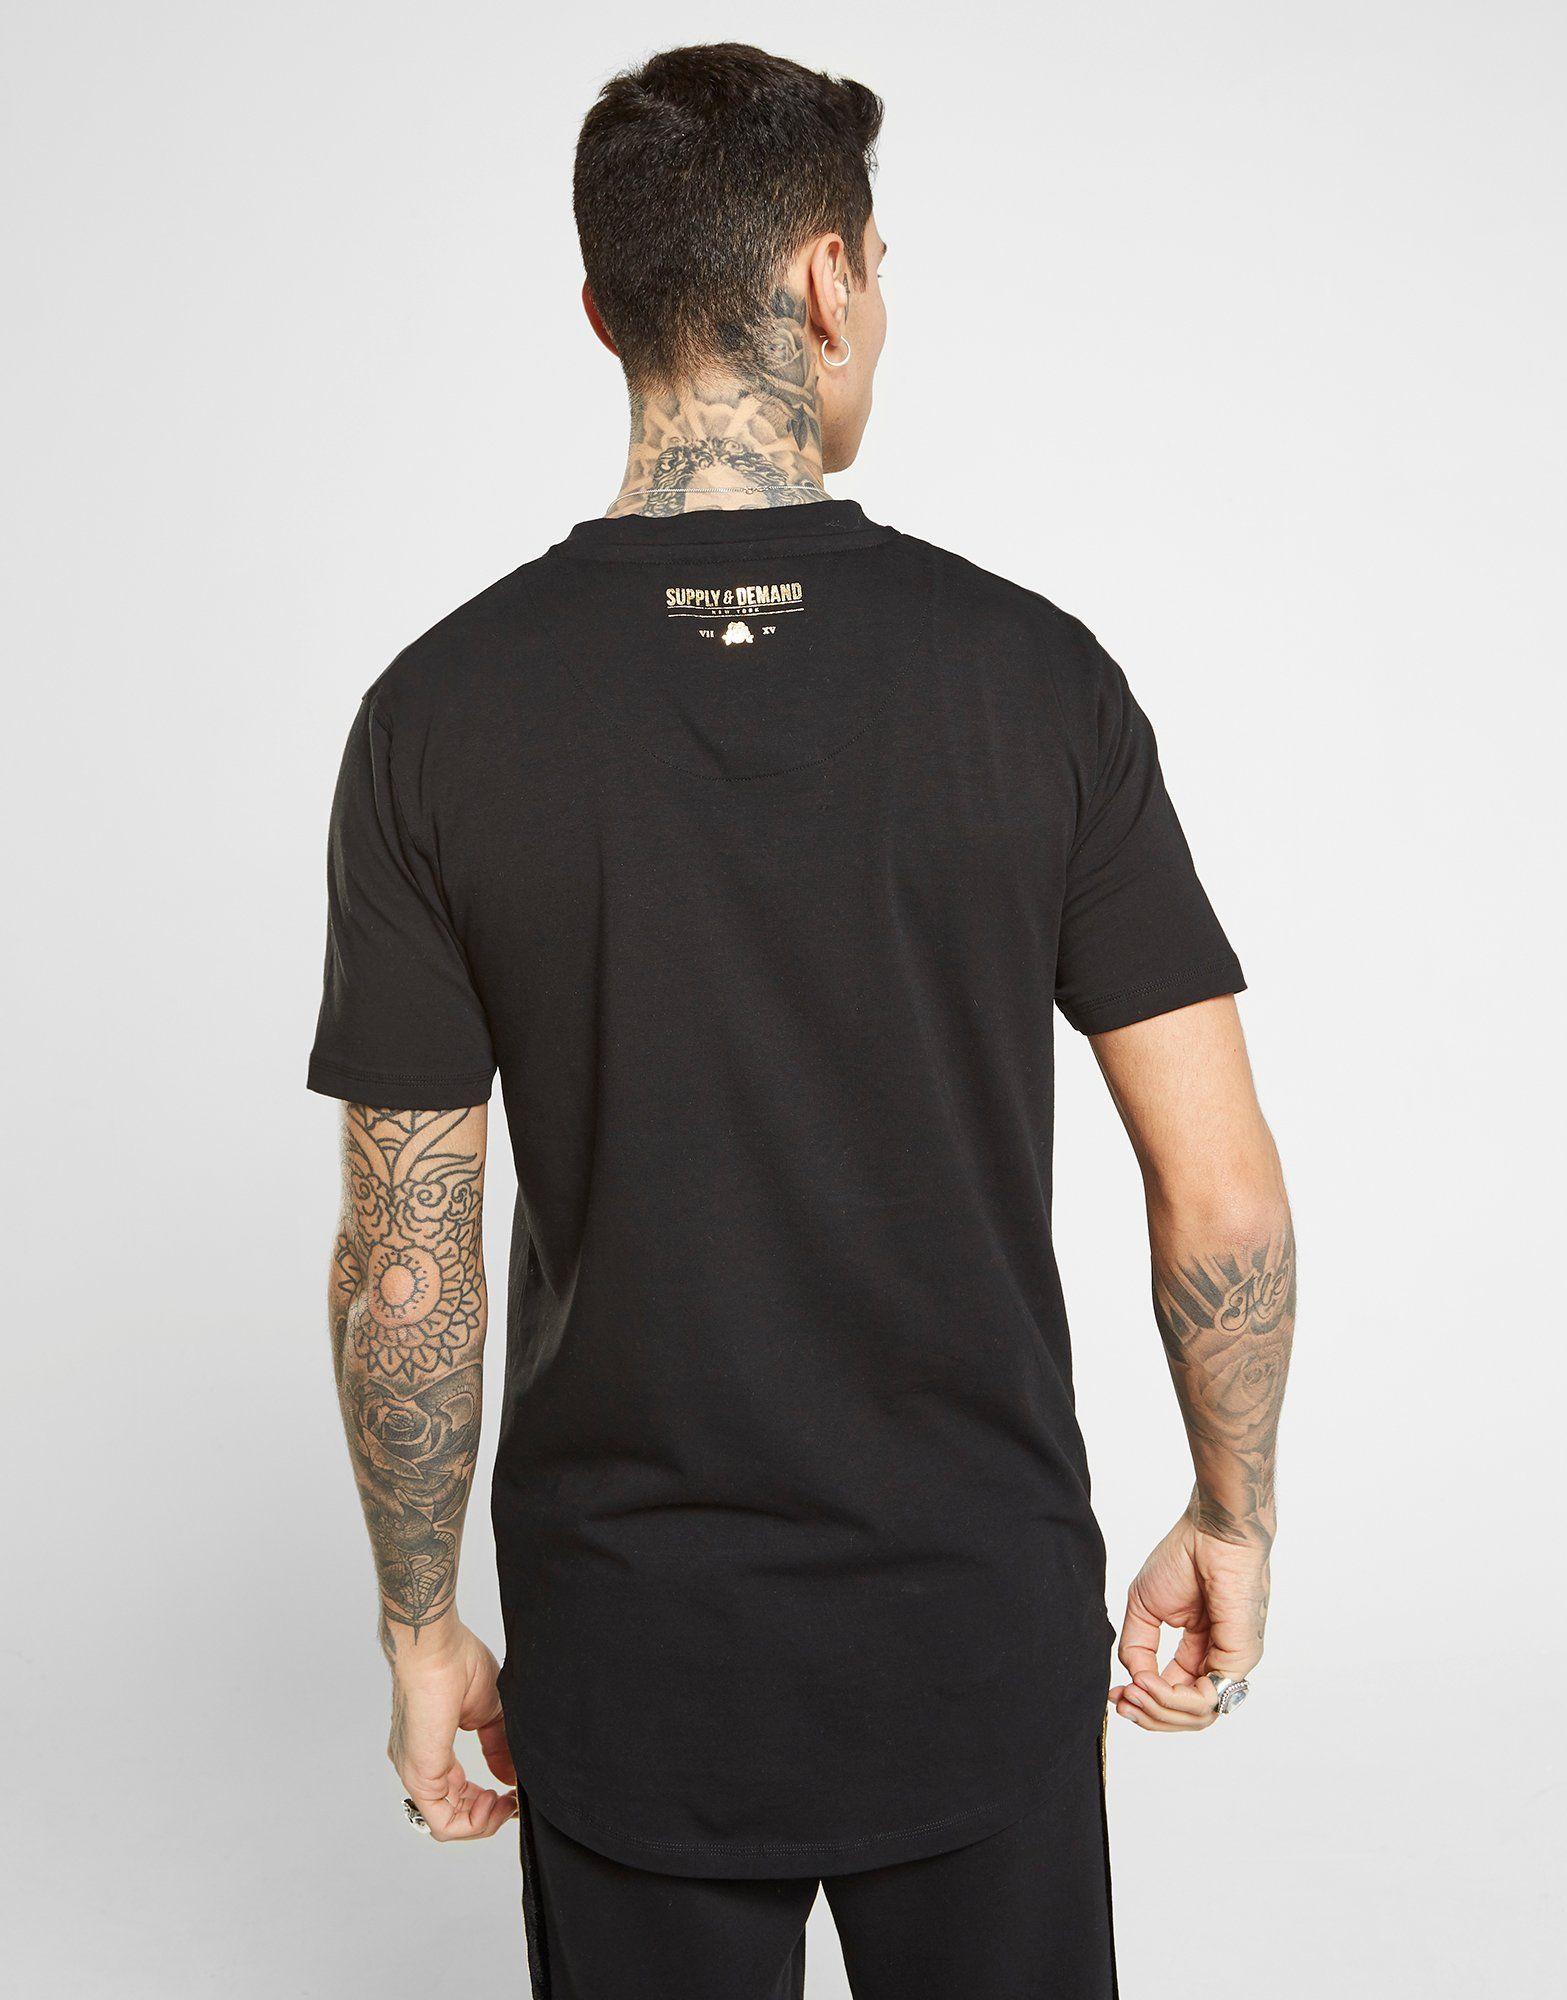 Supply & Demand Shine T-Shirt